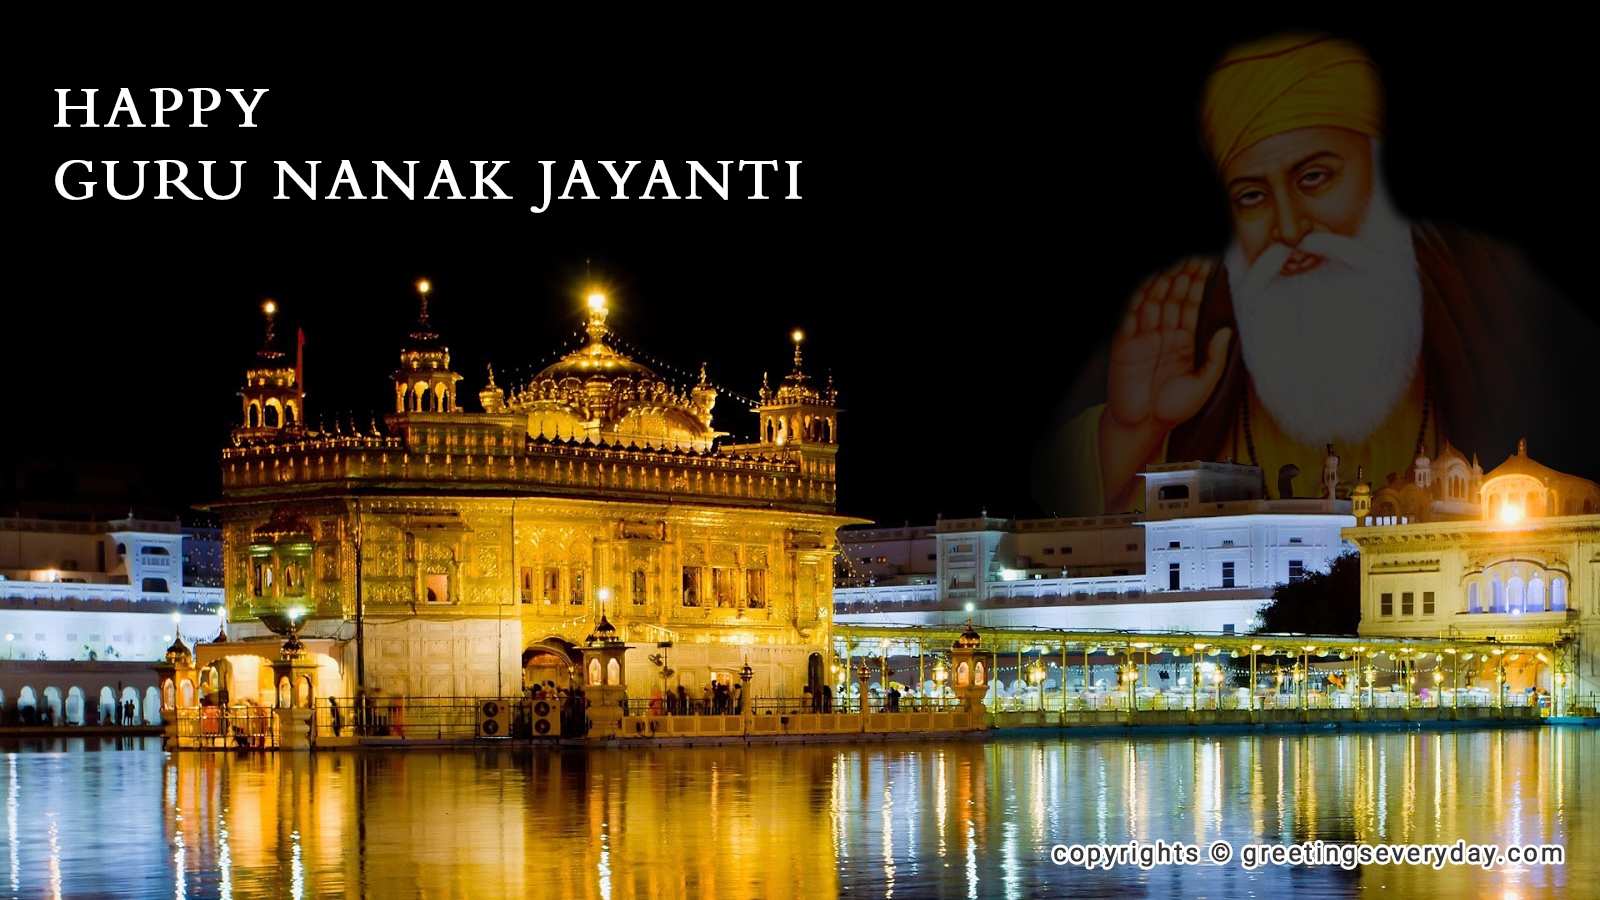 Guru Nanak Jayanti Picture WhatsApp